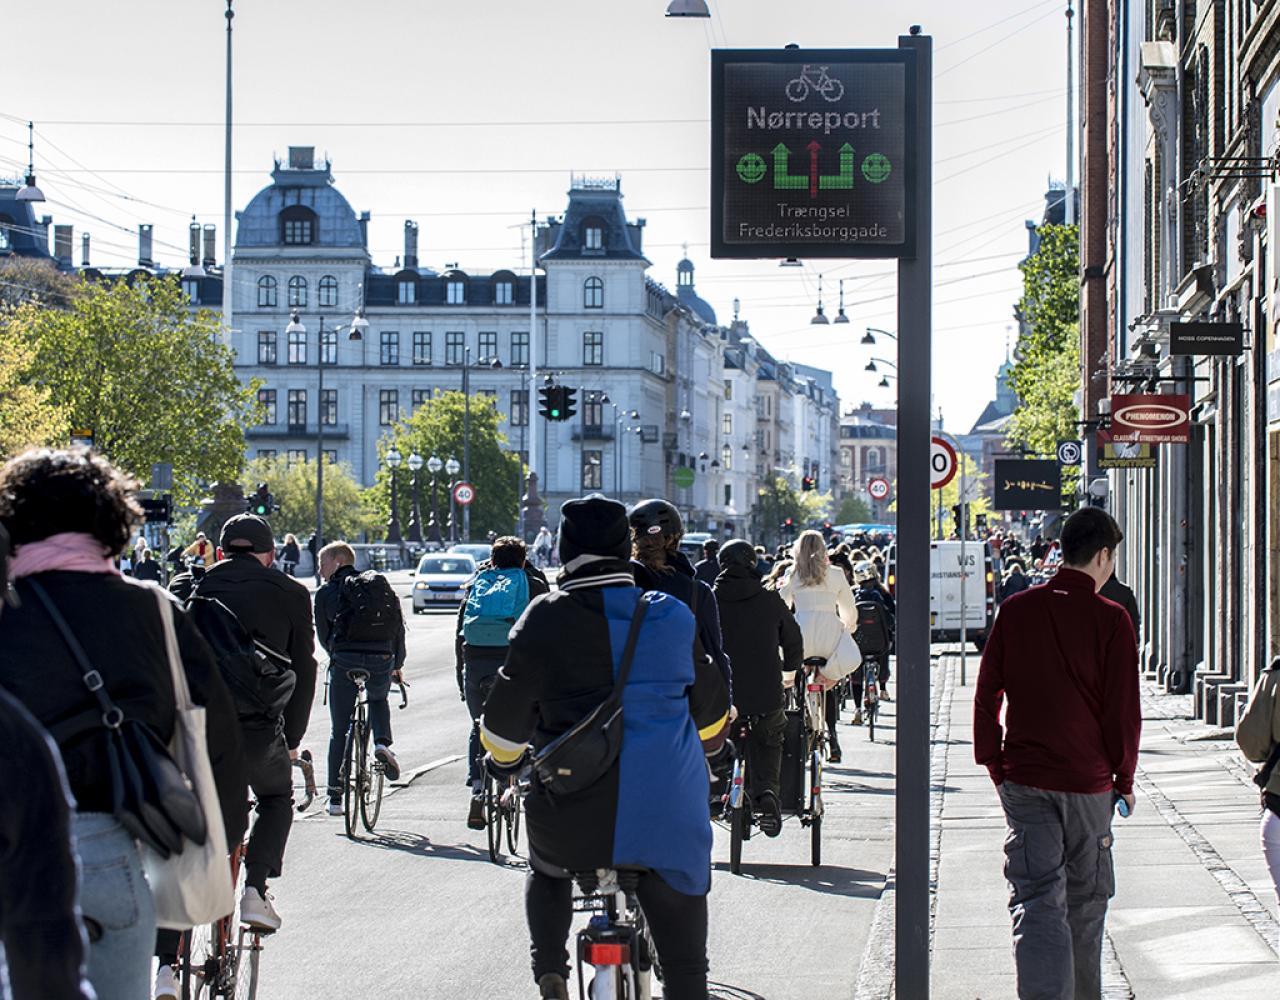 cykel informationstavle nørrebrogade